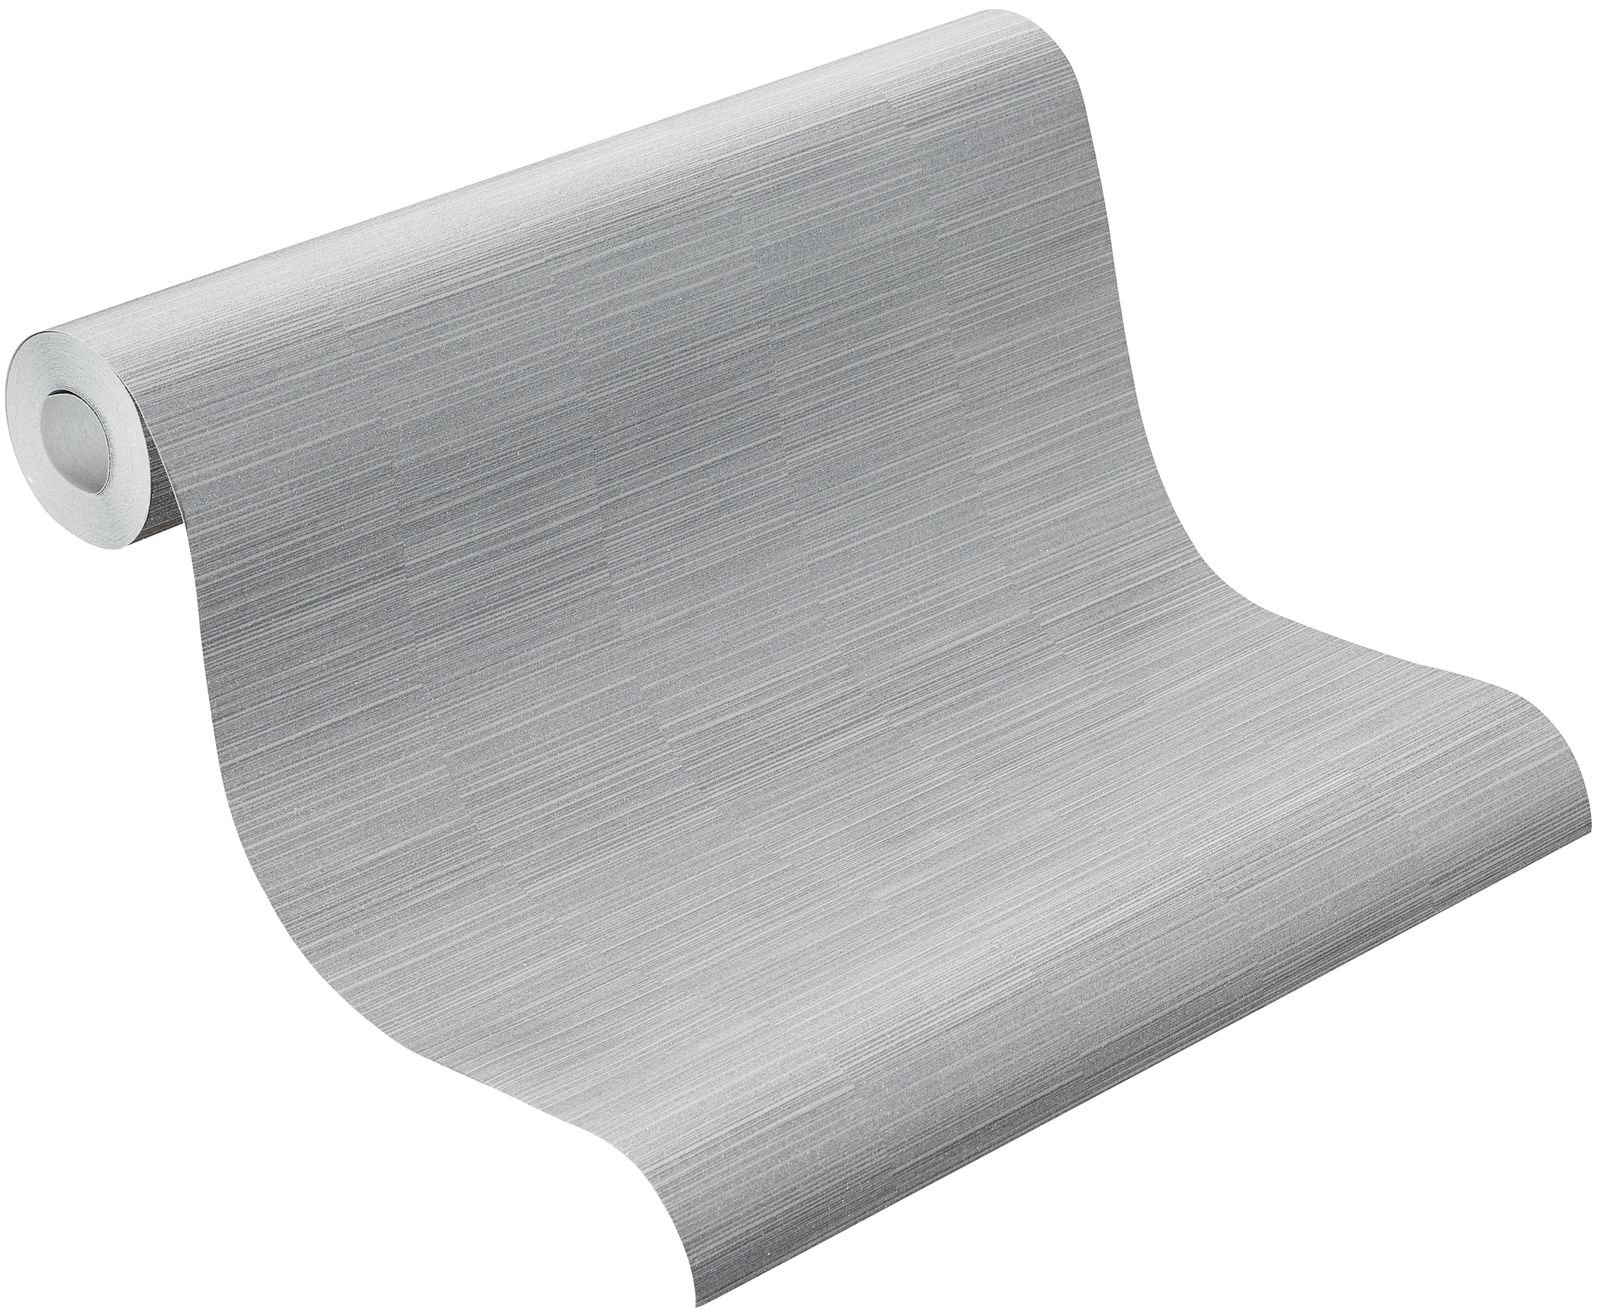 vliestapete rasch deco style meliert grau silber 773811. Black Bedroom Furniture Sets. Home Design Ideas